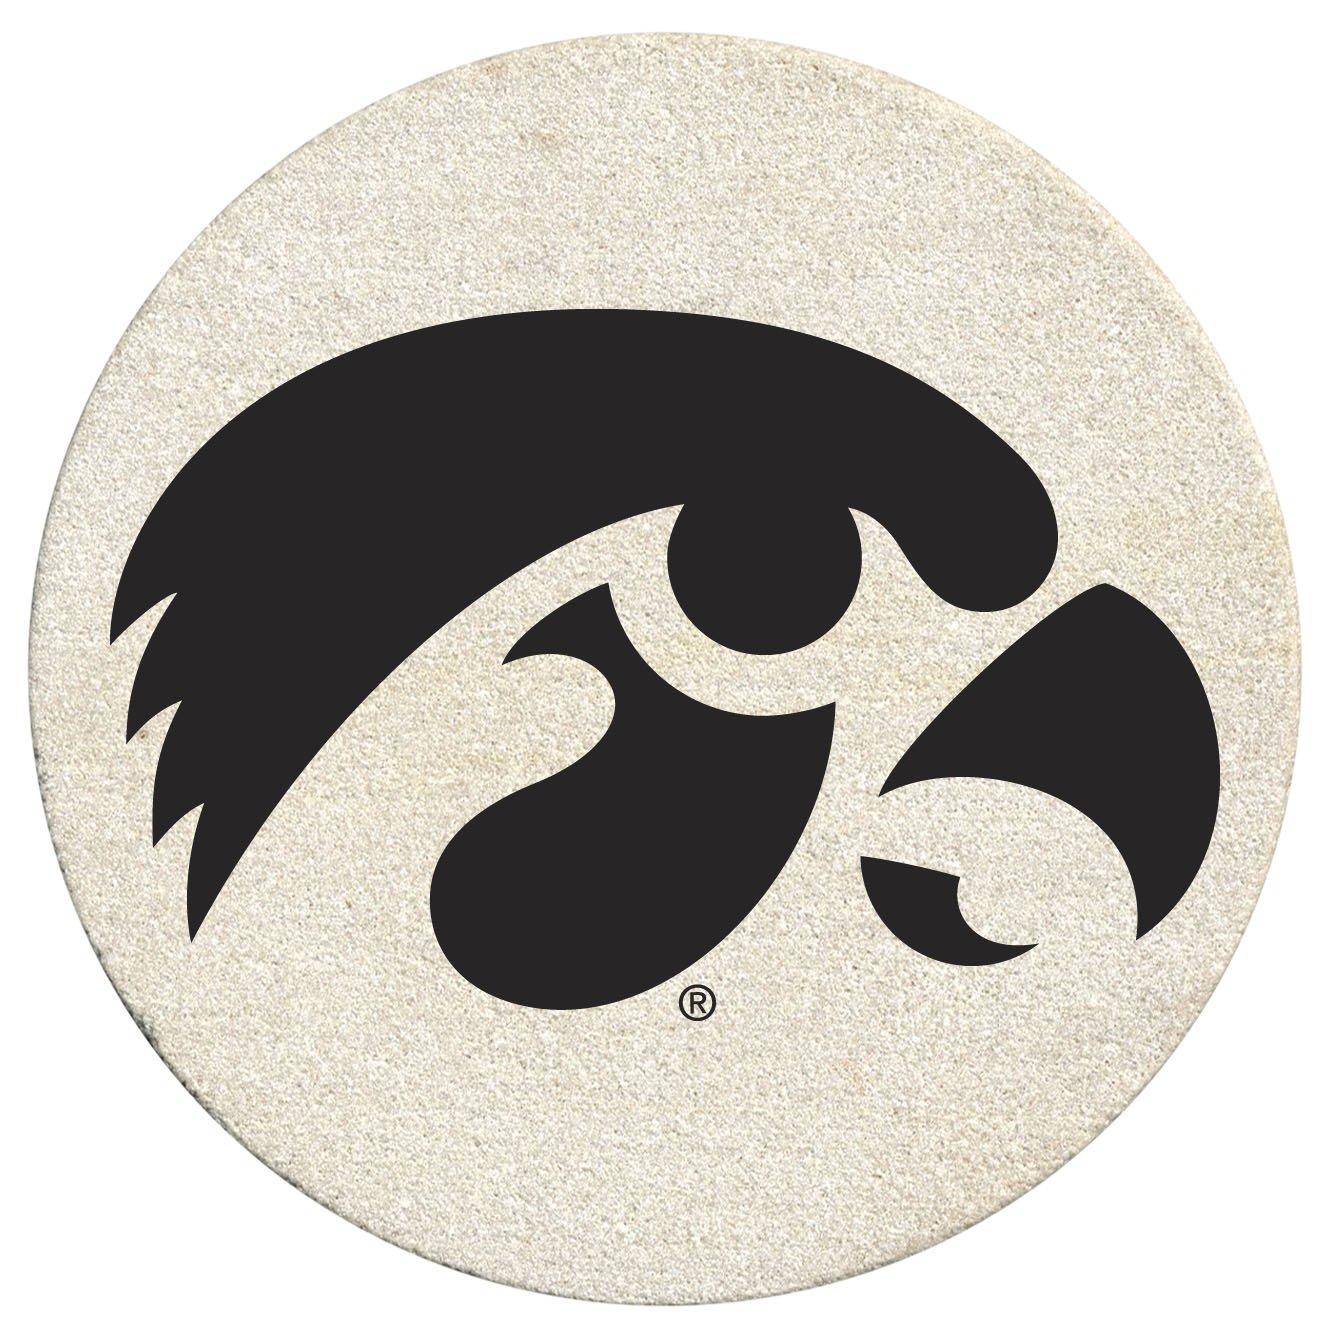 Thirstystone Drink Coaster Set University of Iowa